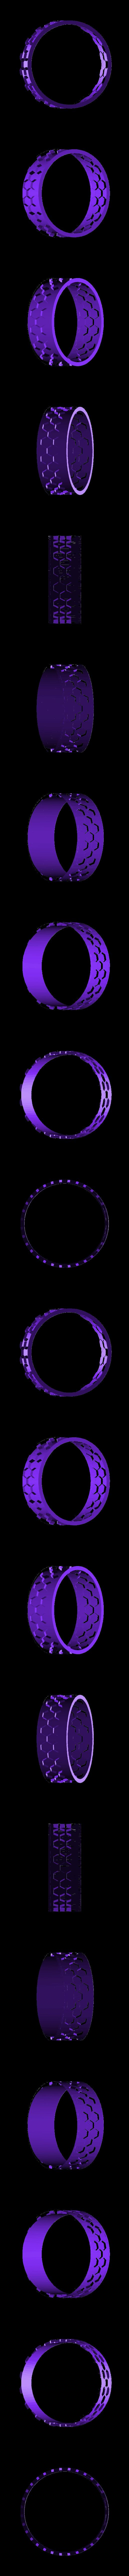 3DSets_Tire_Inserts_-_Weighted.stl Télécharger fichier STL gratuit 3DSets Rancher Beadlock Tire Lock Ring (2 options) • Plan imprimable en 3D, FedorSosnin